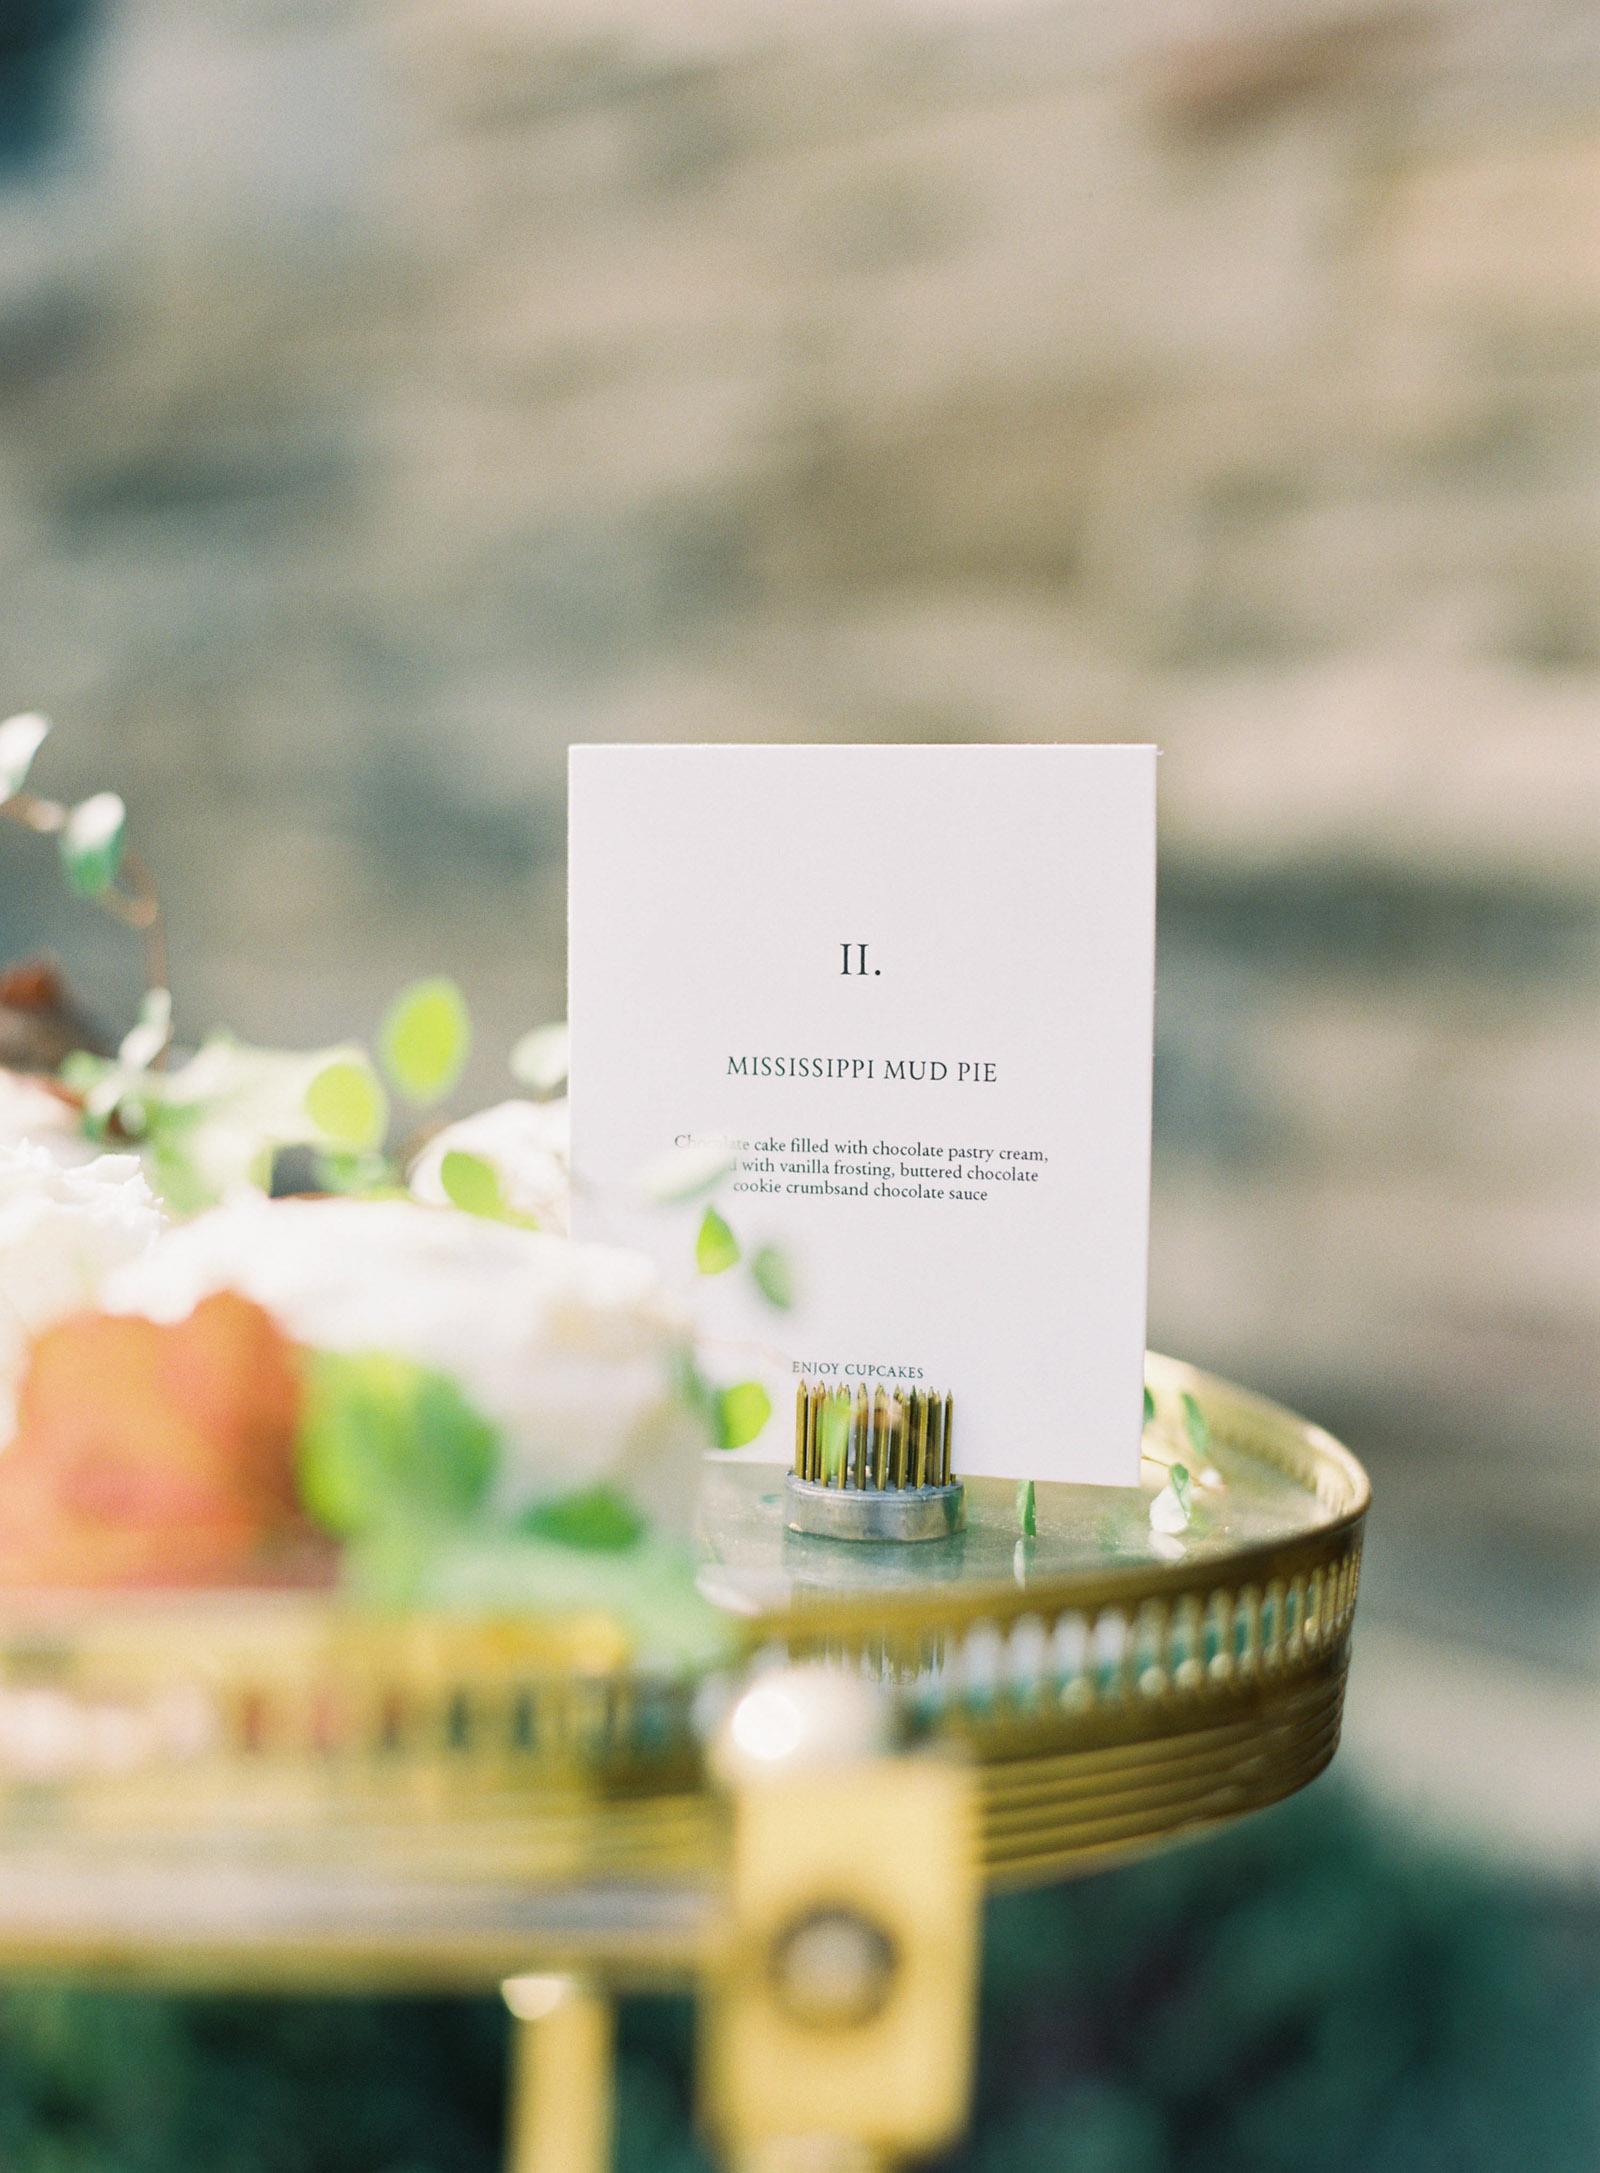 VB-Web-166-Jen-Huang-Decade-Dinner-Selects-71-Jen-Huang-006303-R3-005.jpg